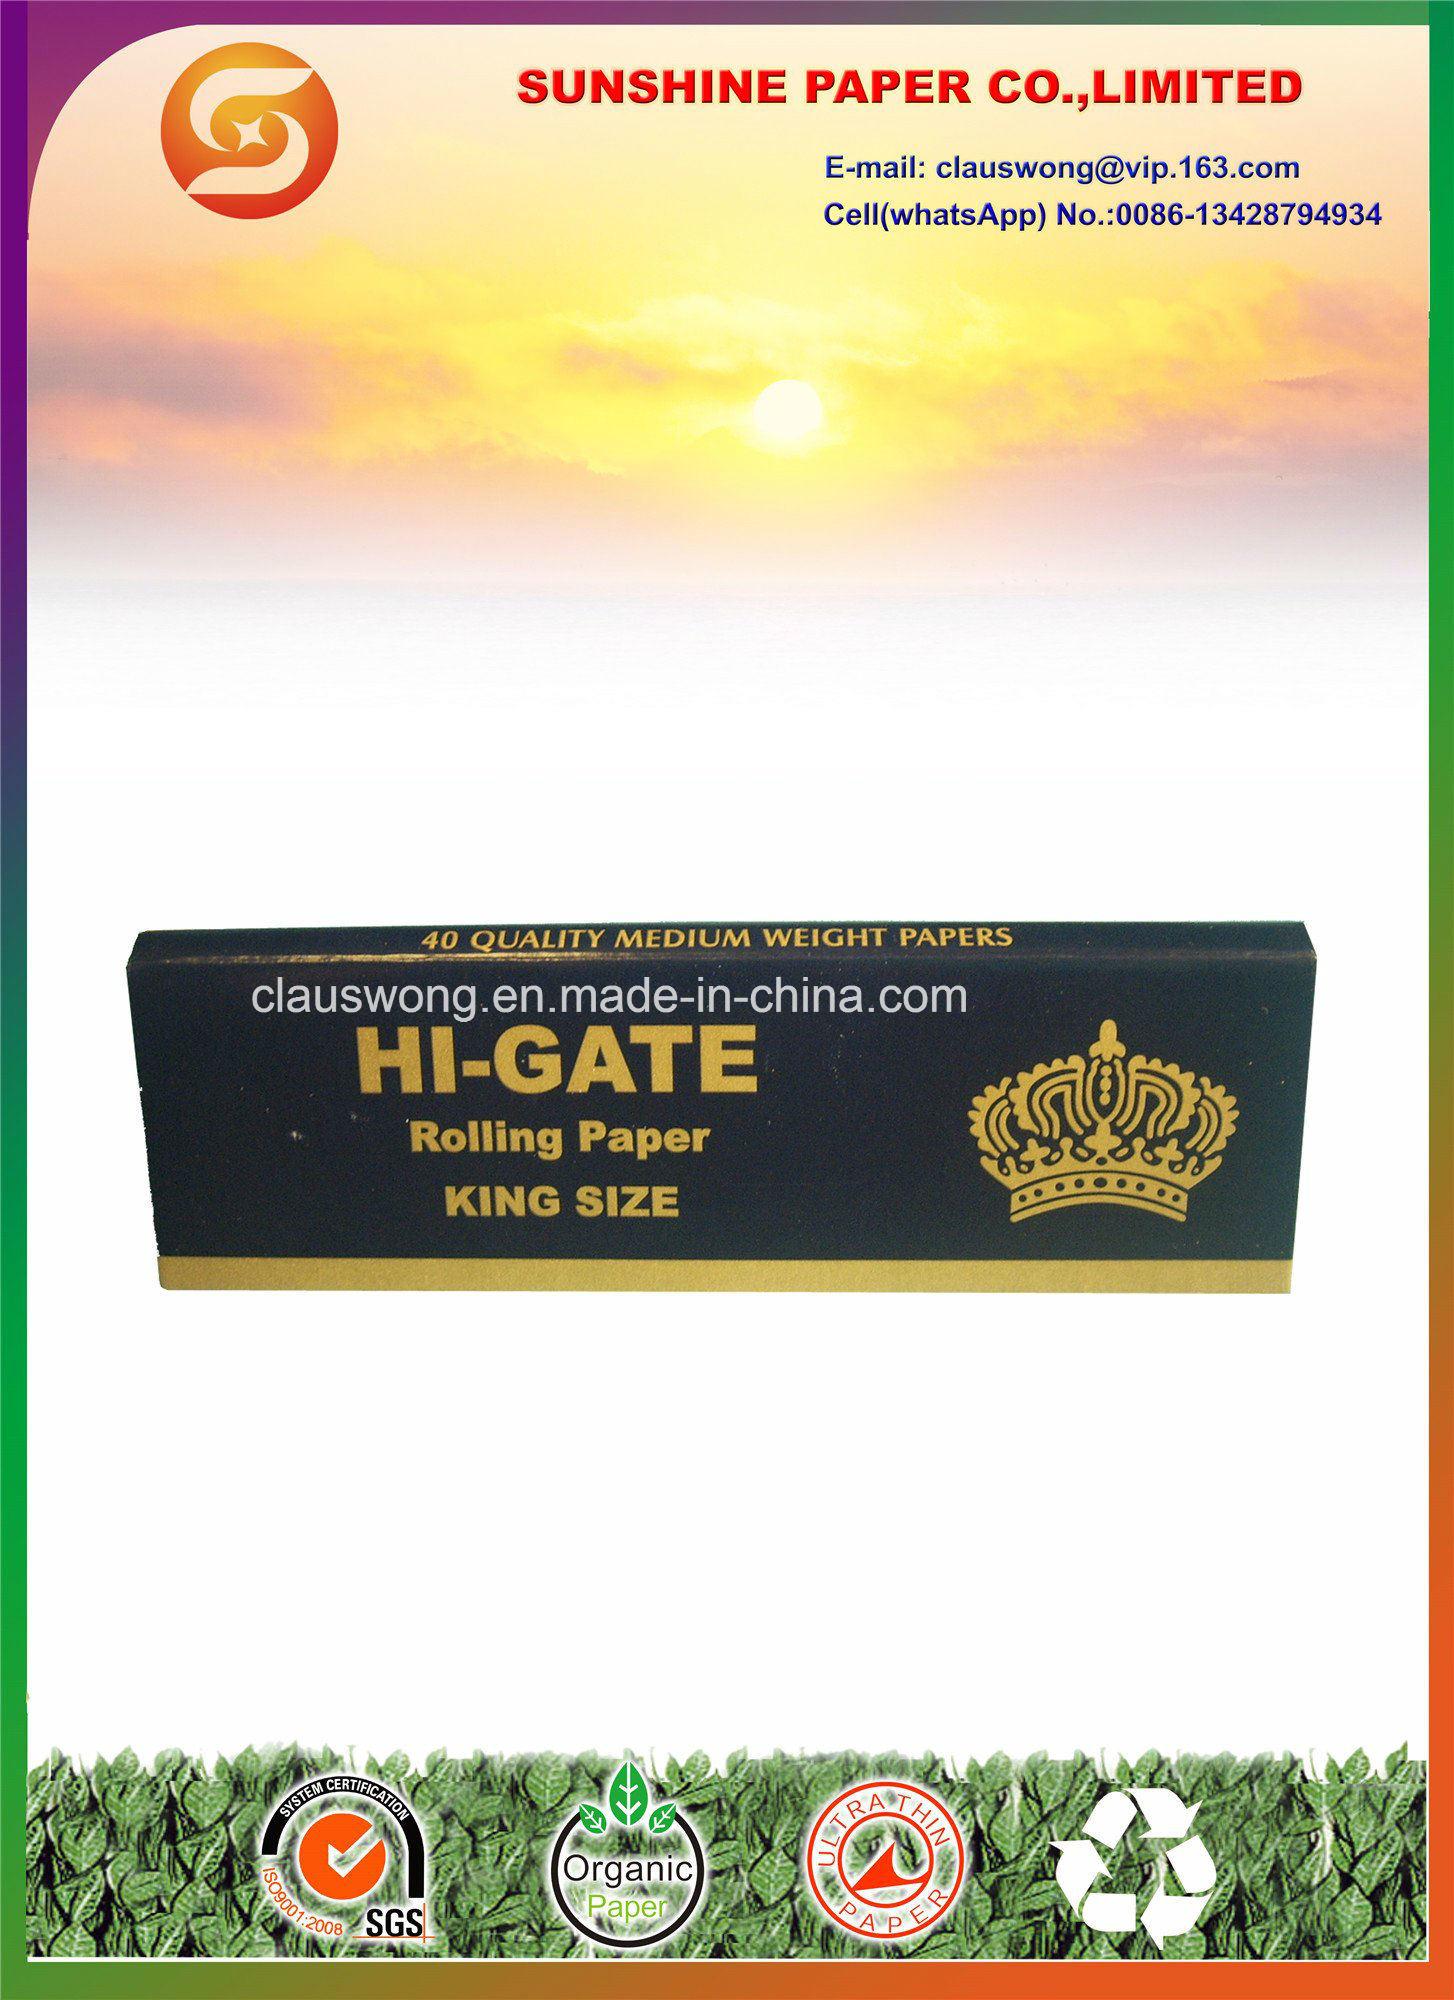 King Size Hi-Gate Cigarette Paper